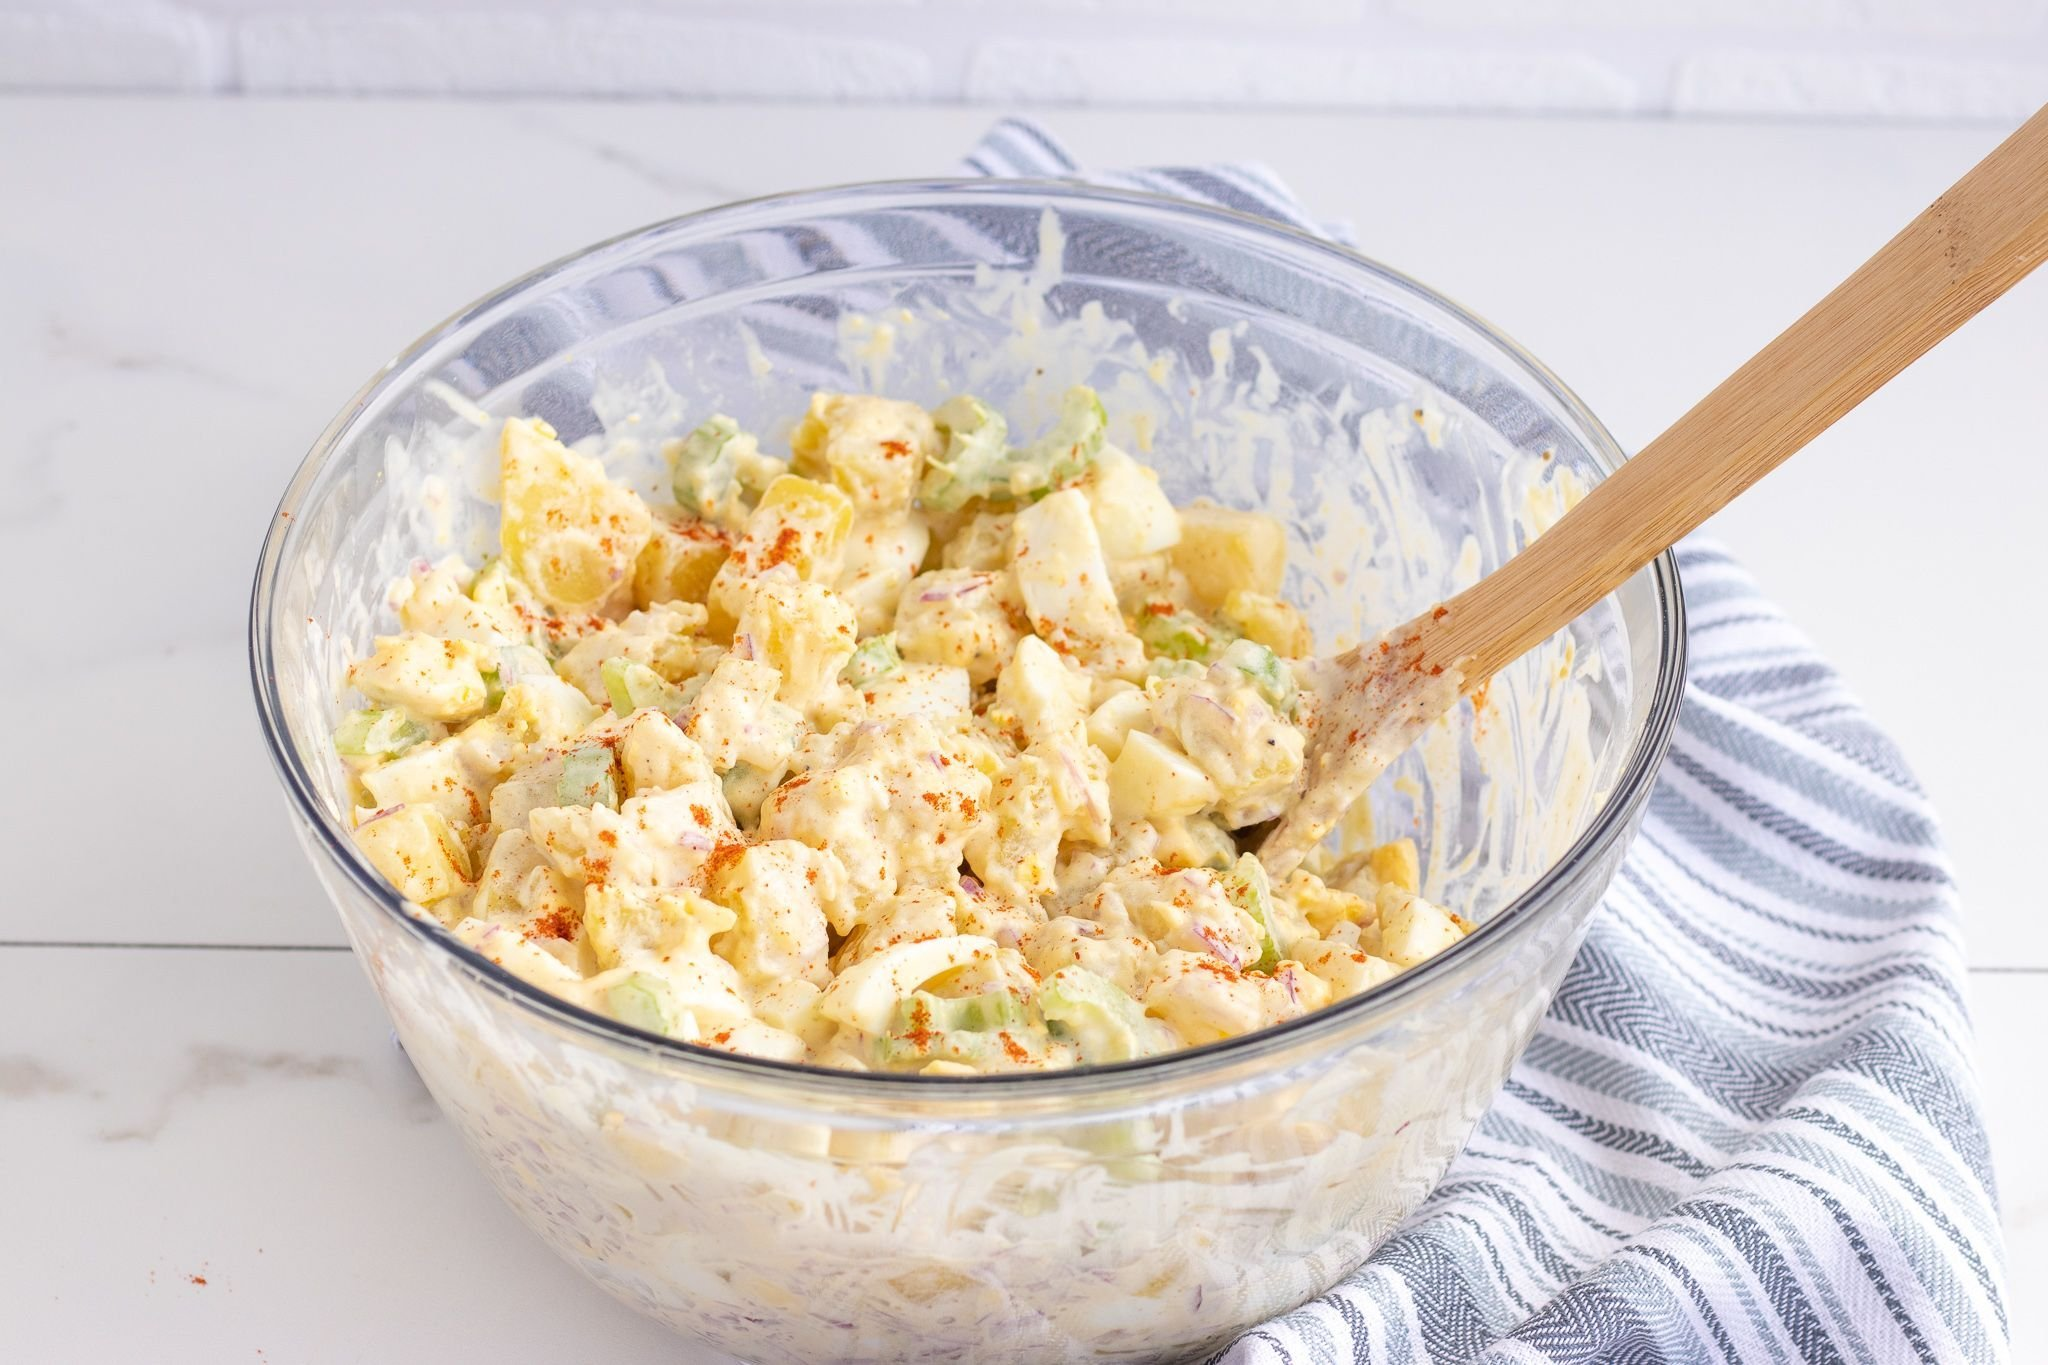 Quick and Easy Instant Pot Potato Salad